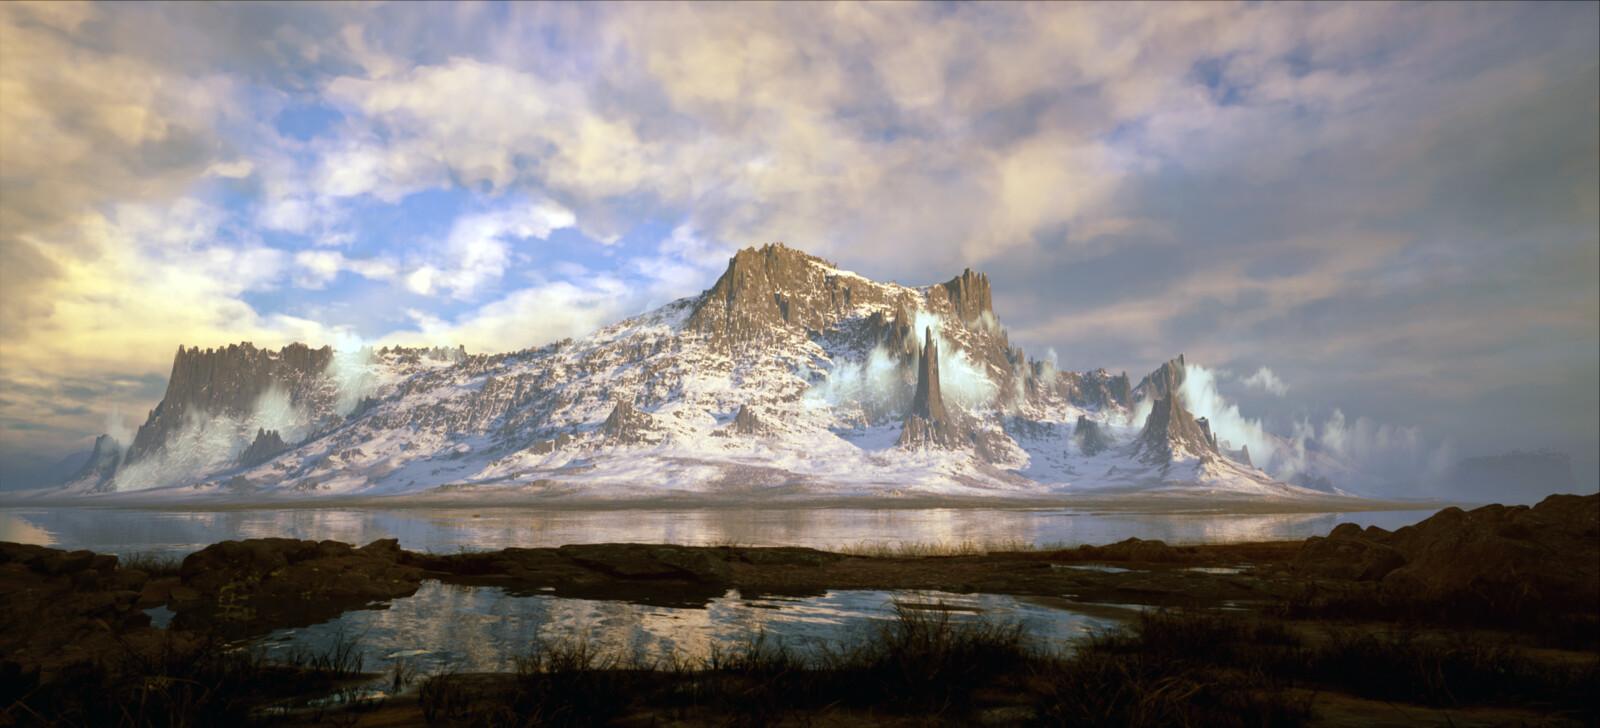 Red Mountain // Unreal Engine Animation // World Creator // 4K